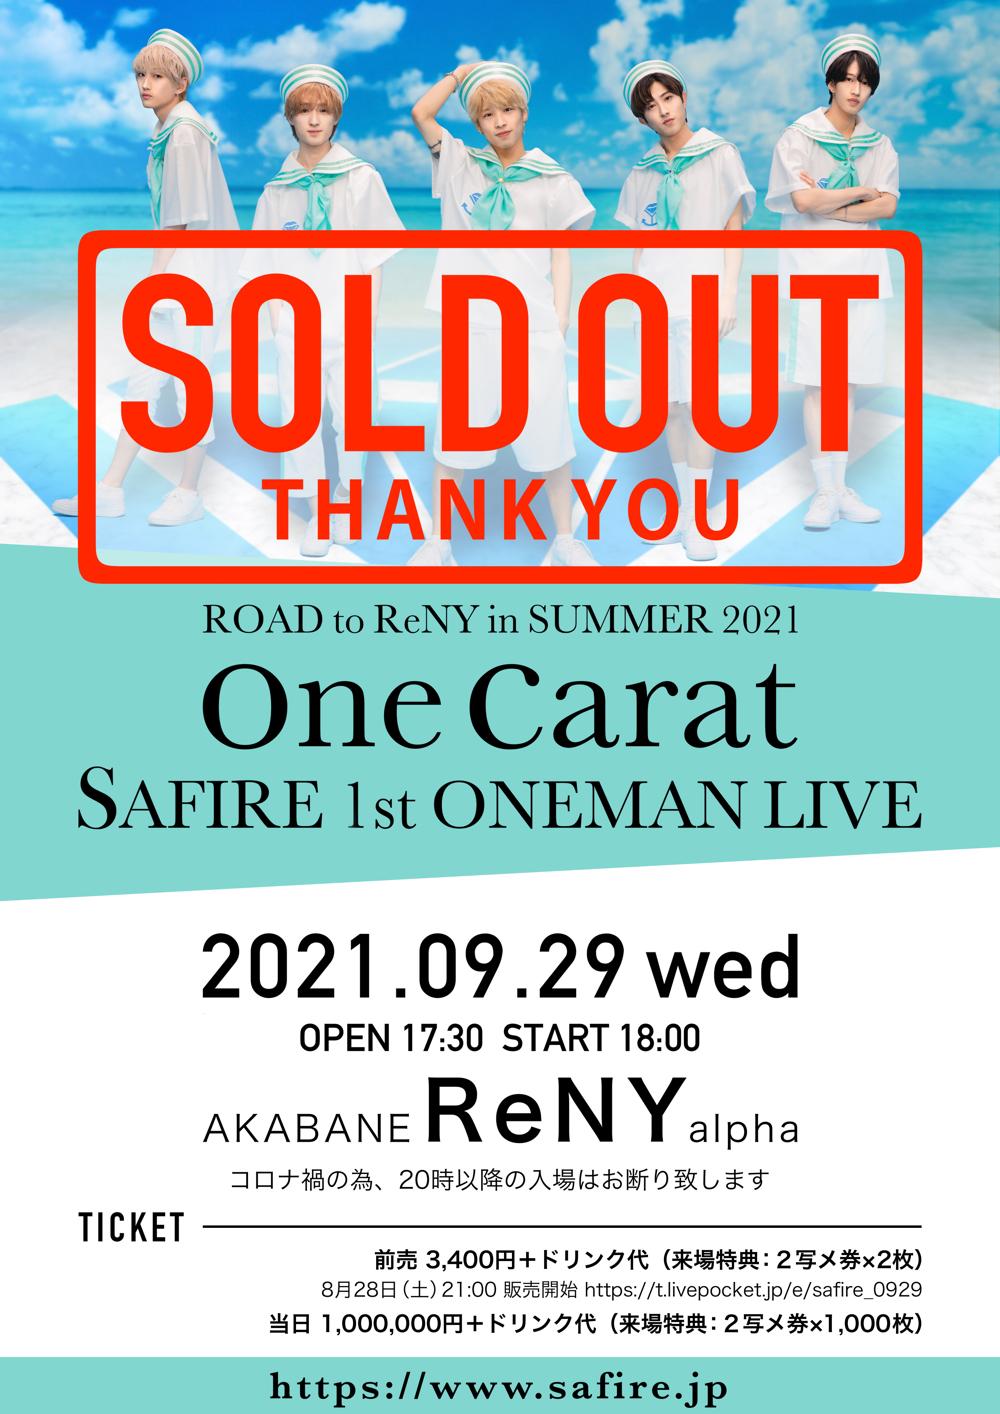 SAFIRE 1st ONEMAN LIVE「One Carat」